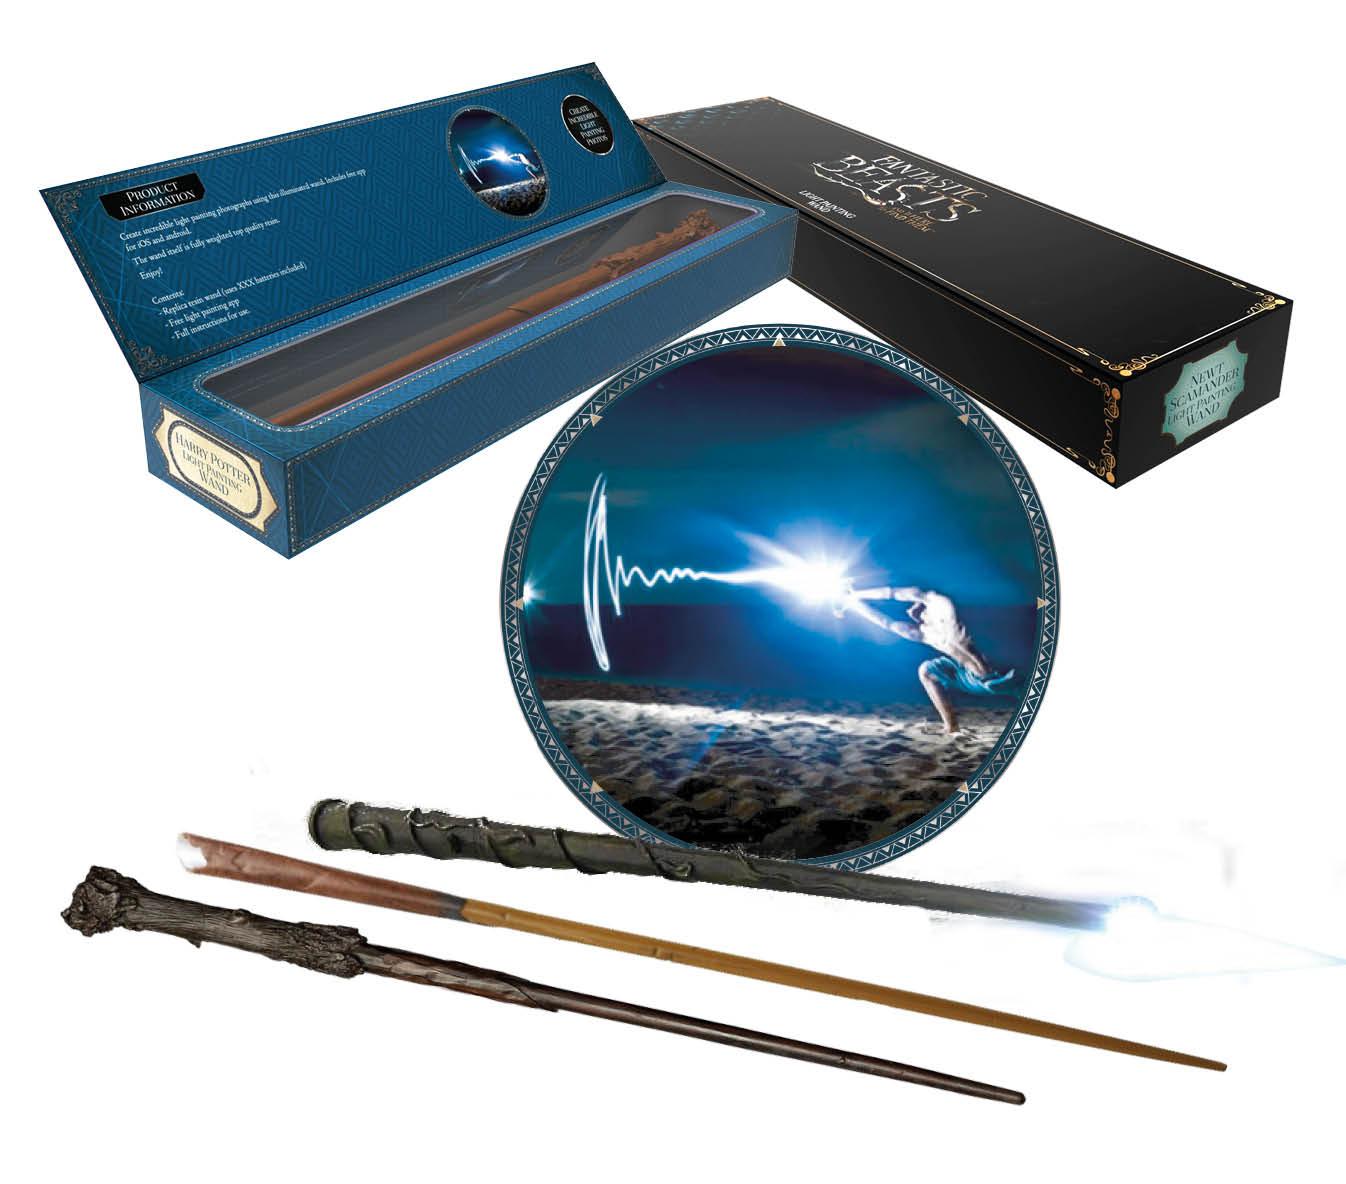 Harry Potter: Light Painting Wand - Harry Potter image